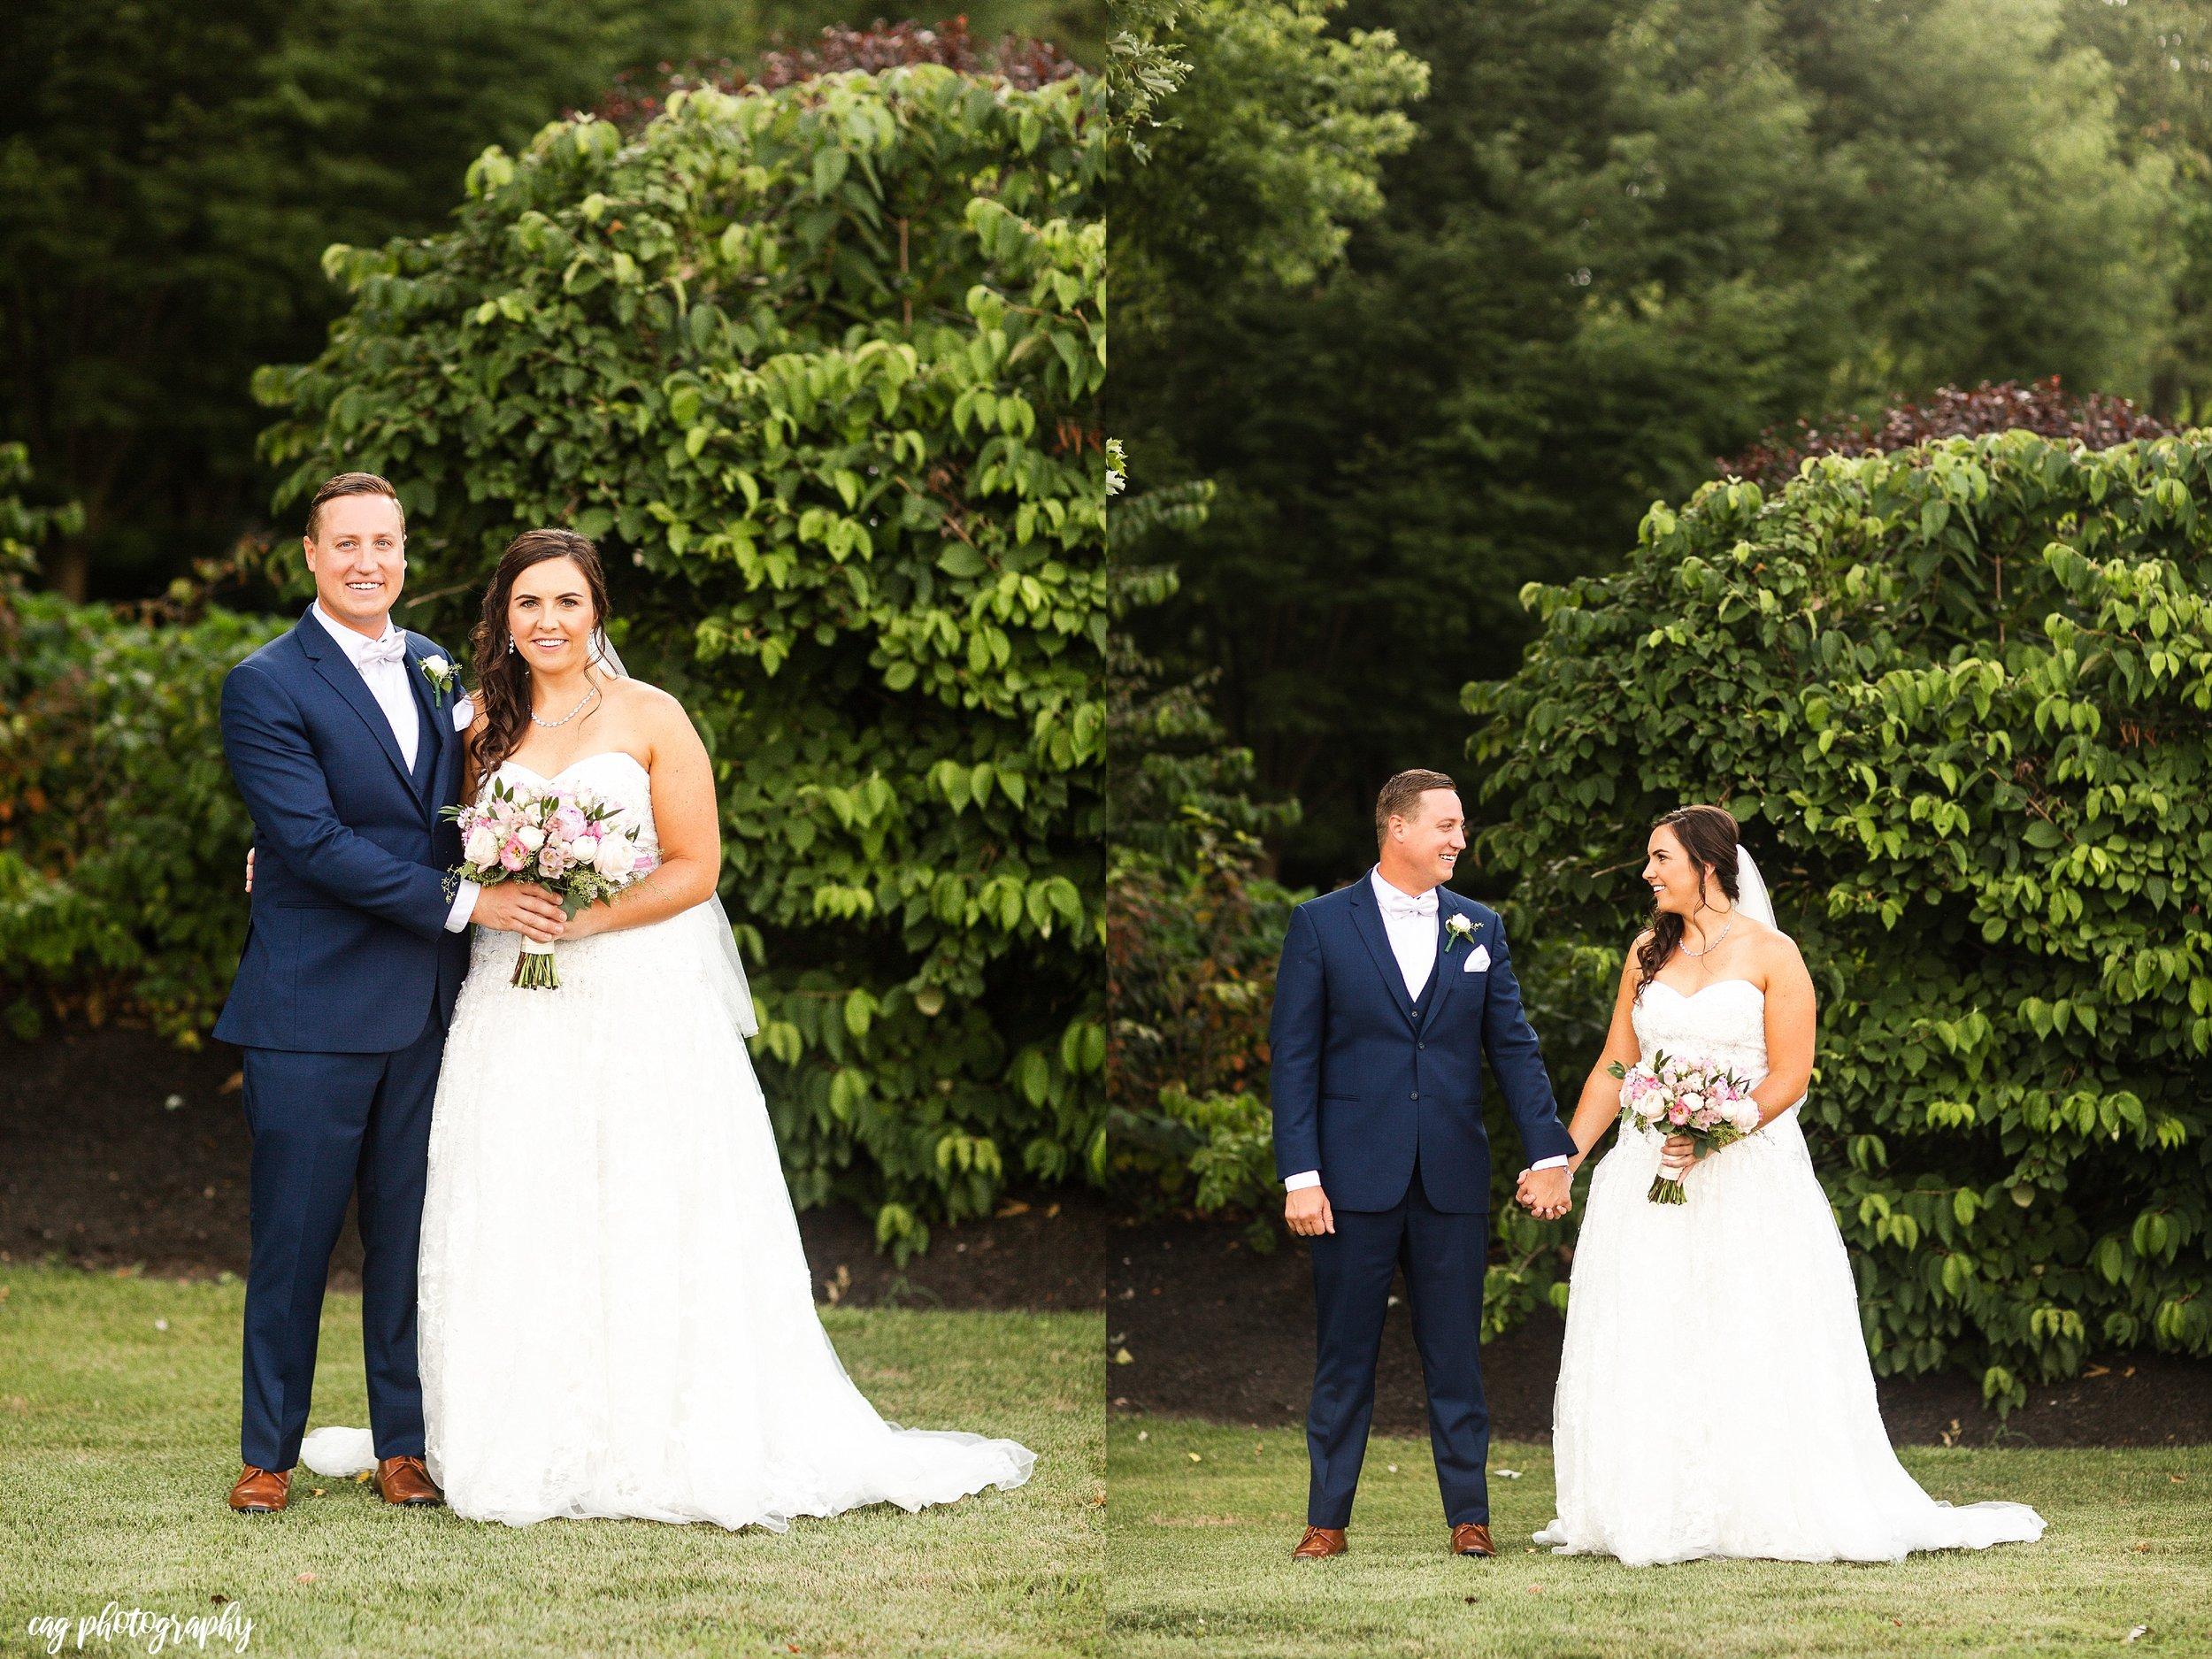 Kristie+Andrew MARRIED-248.jpg